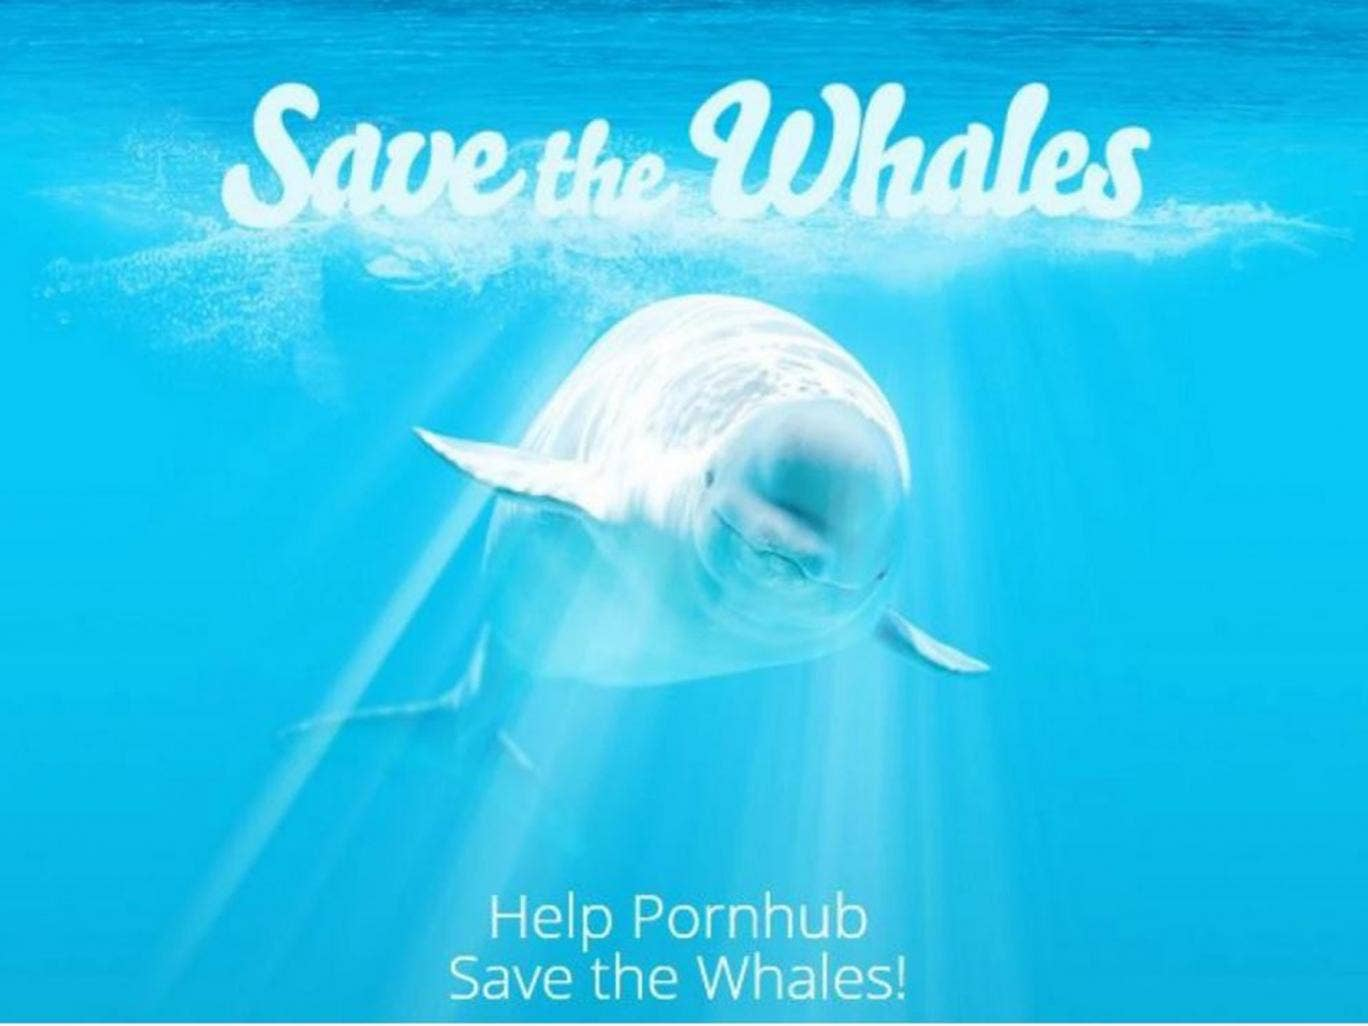 Pornhub save the whales